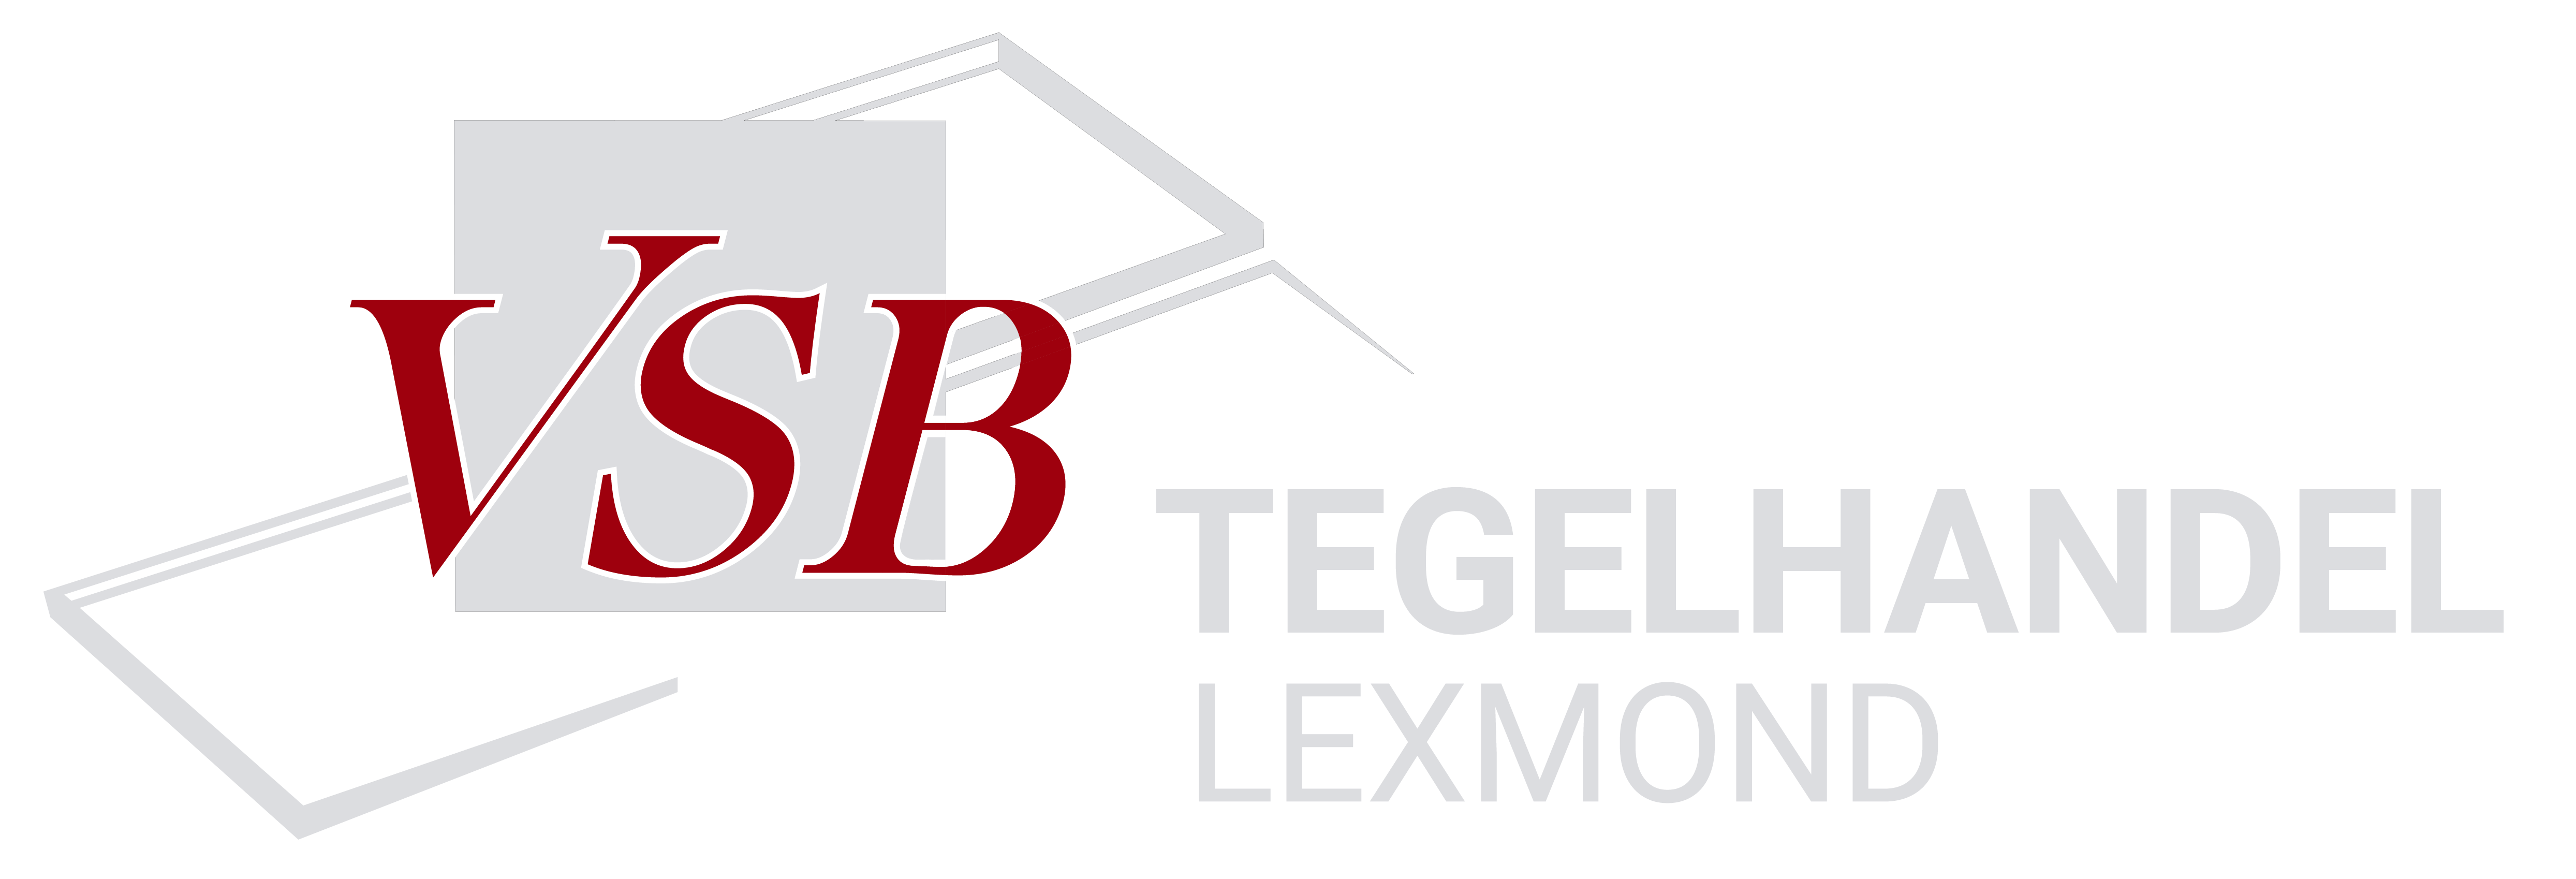 https://tegelhandelvsb.nl/wp-content/uploads/2021/01/VSB-Lexmond_Logo_Klein_Grijs-01.png